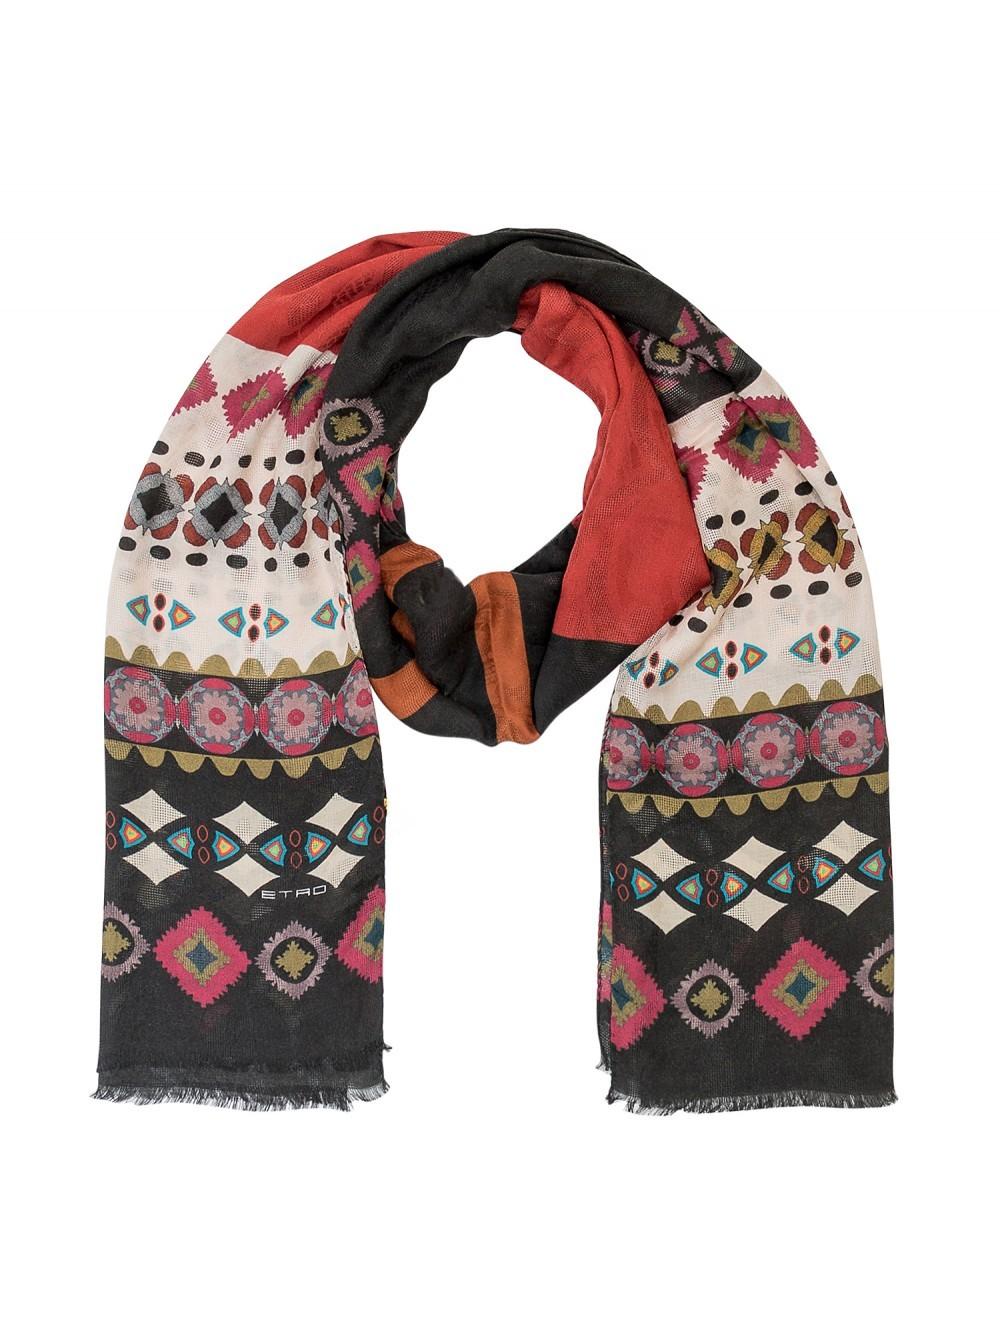 Wool Paisley Scarf | Etro Skirt | Etro Scarf